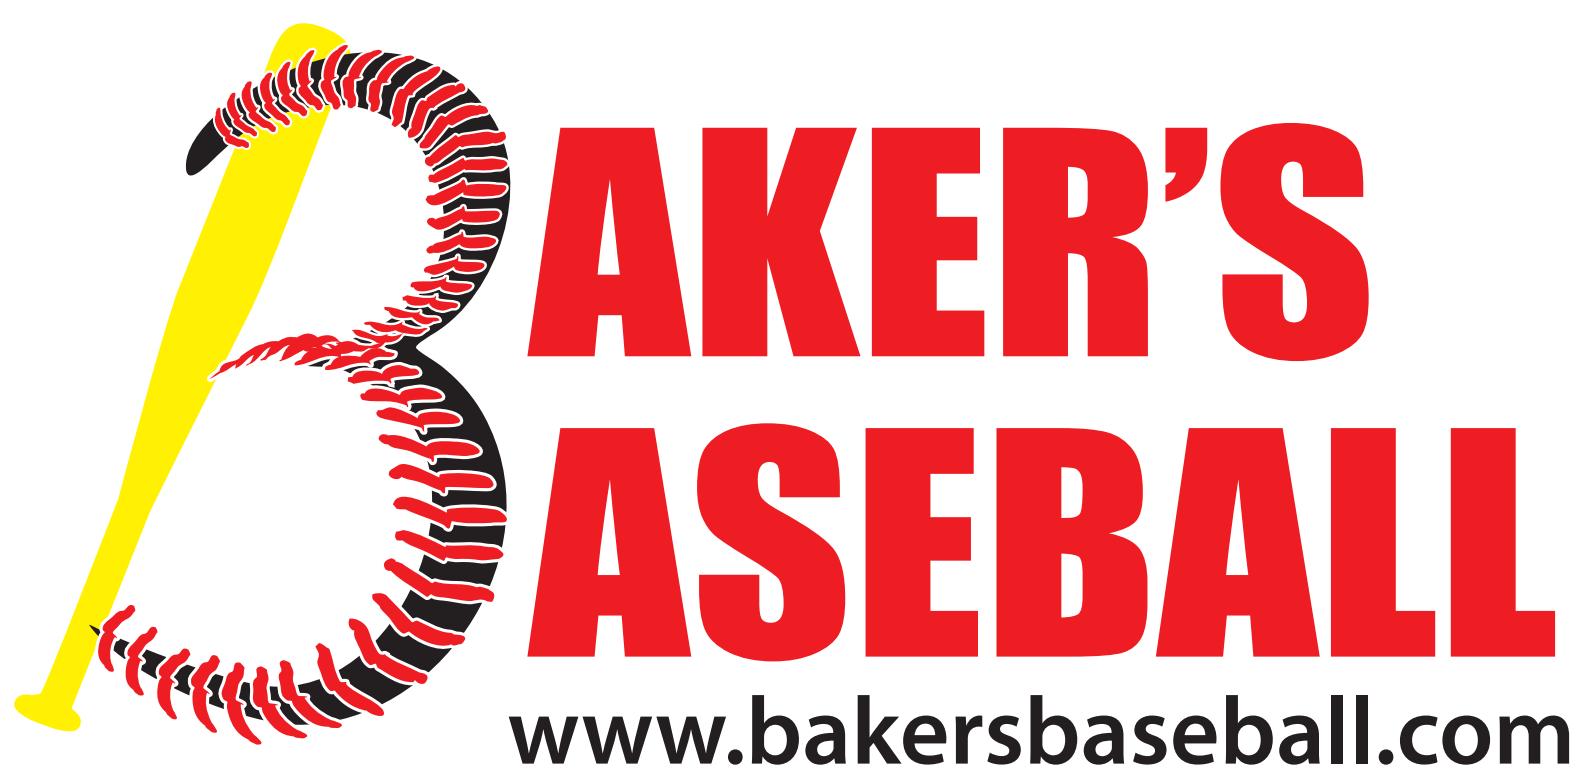 bakersbaseball